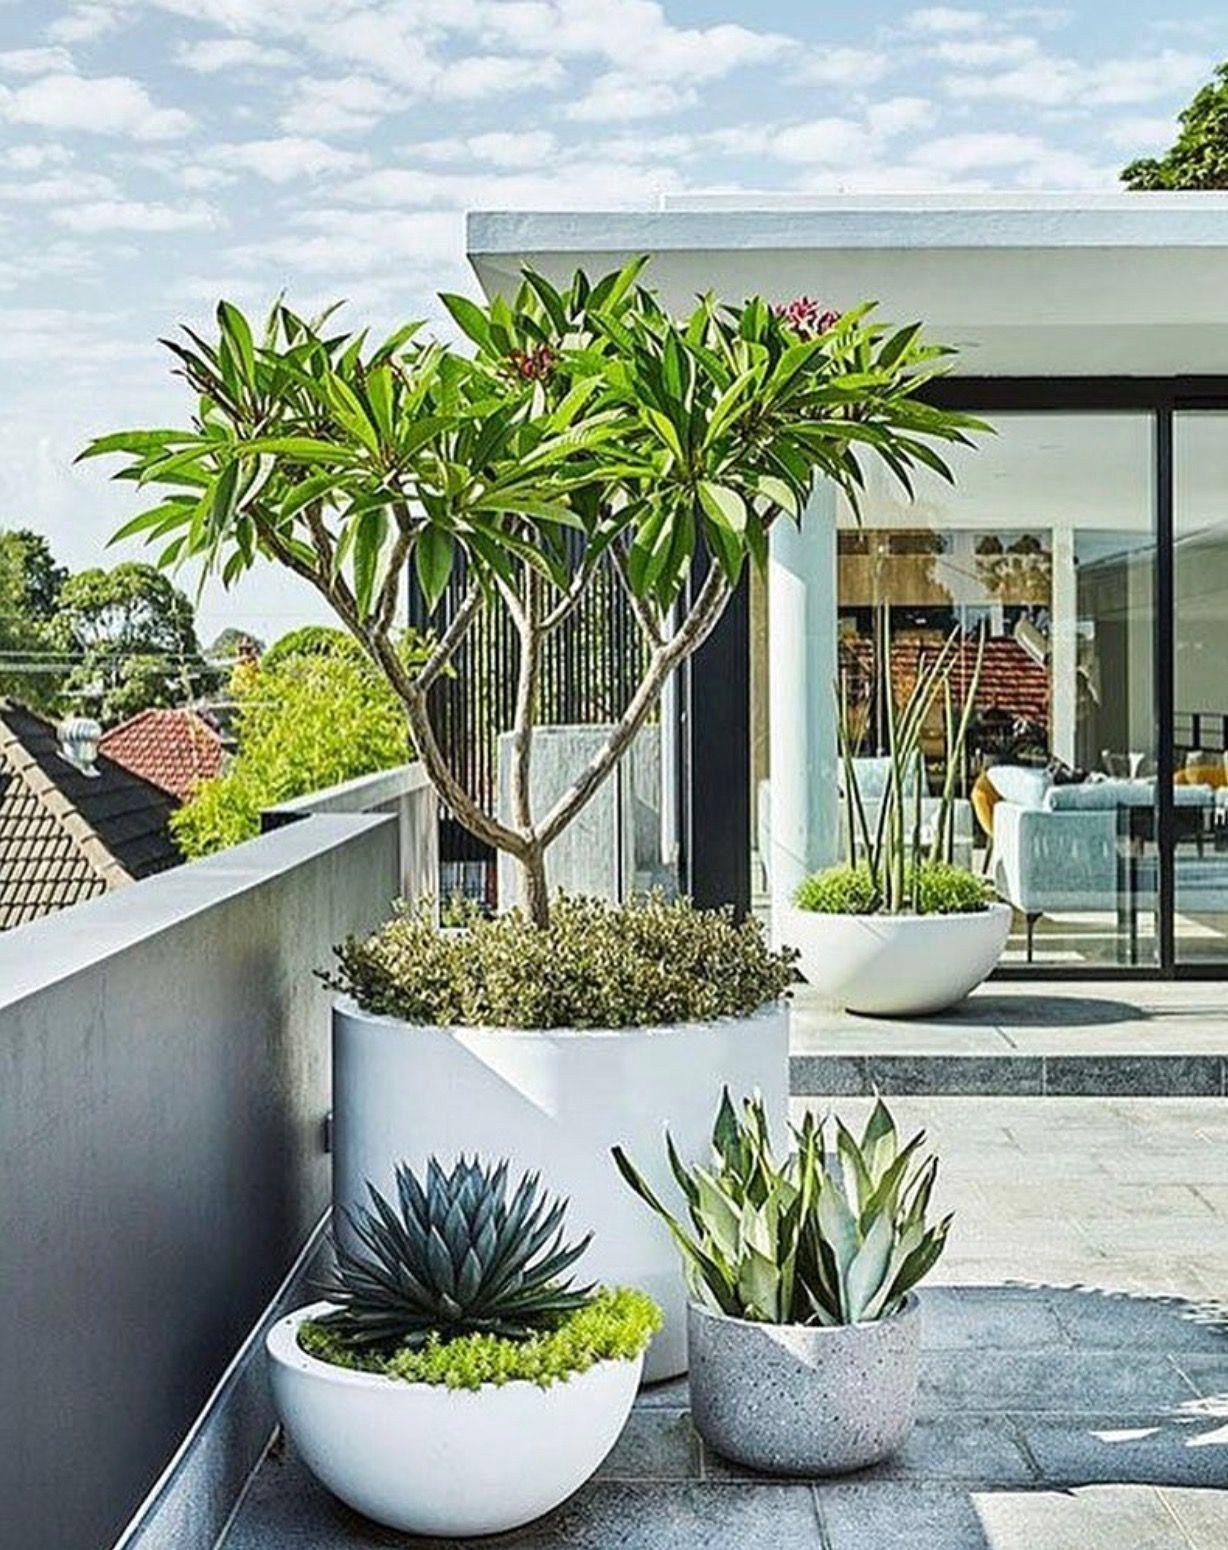 Best Modern Front Yard Landscaping Ideas 32 Home Decor Diy Design